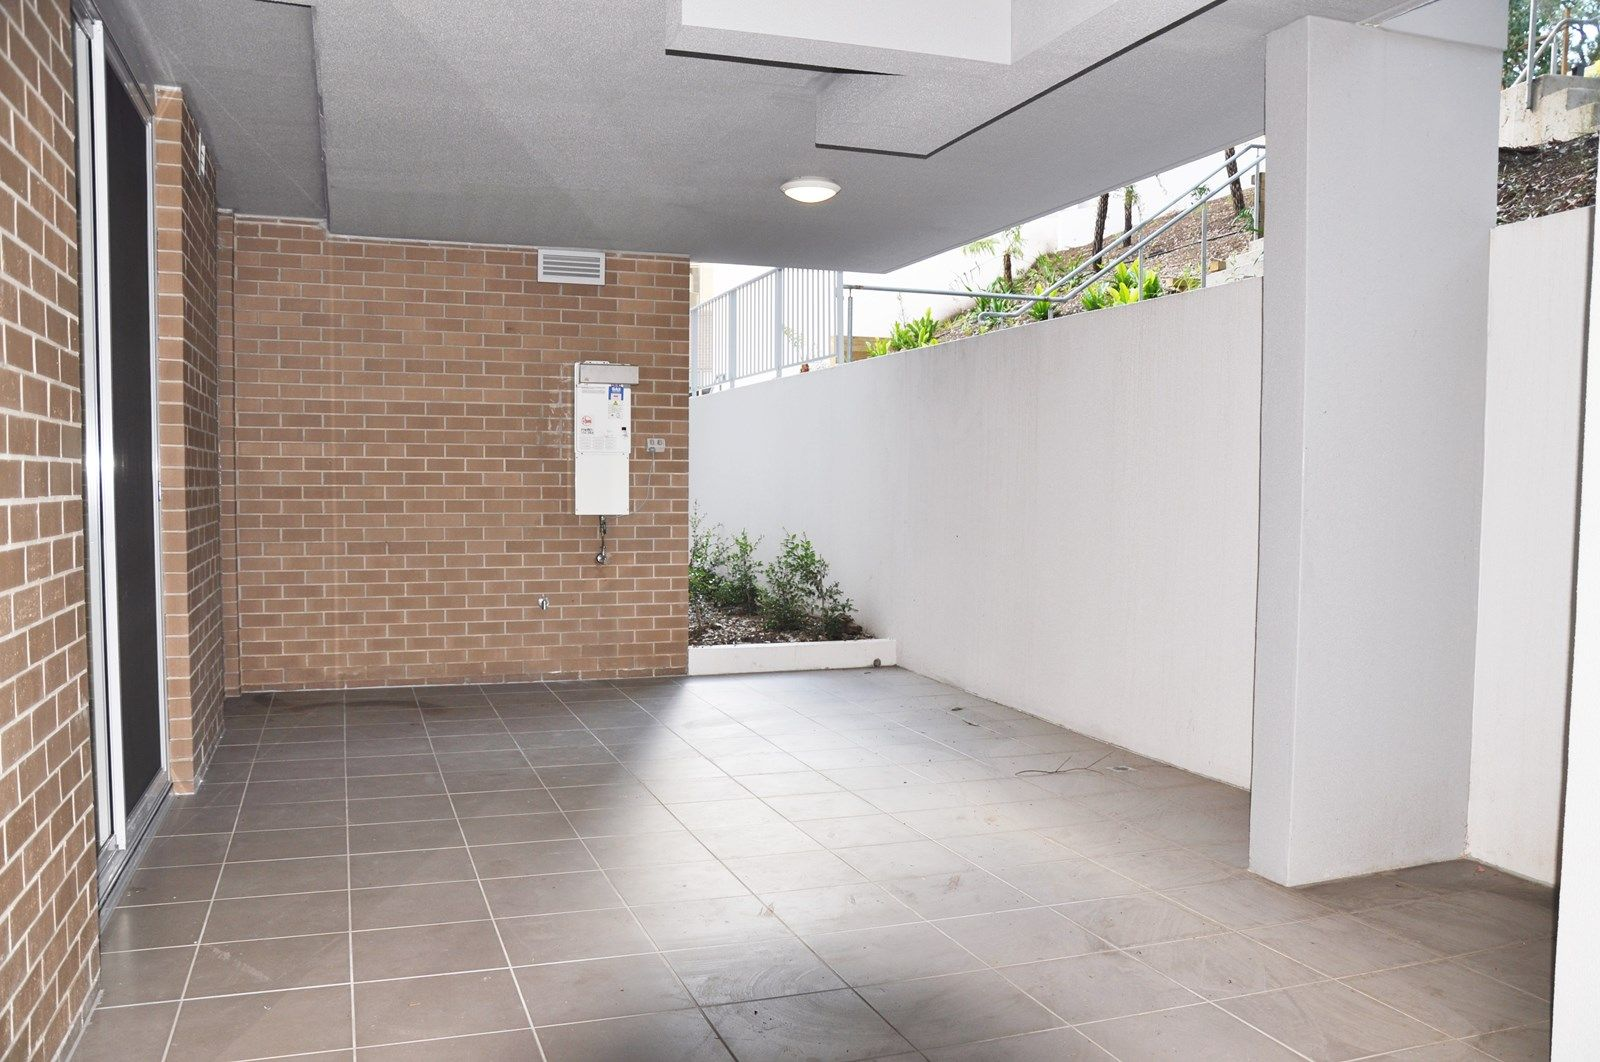 52/5-15 Lamond Drive, Turramurra NSW 2074, Image 6